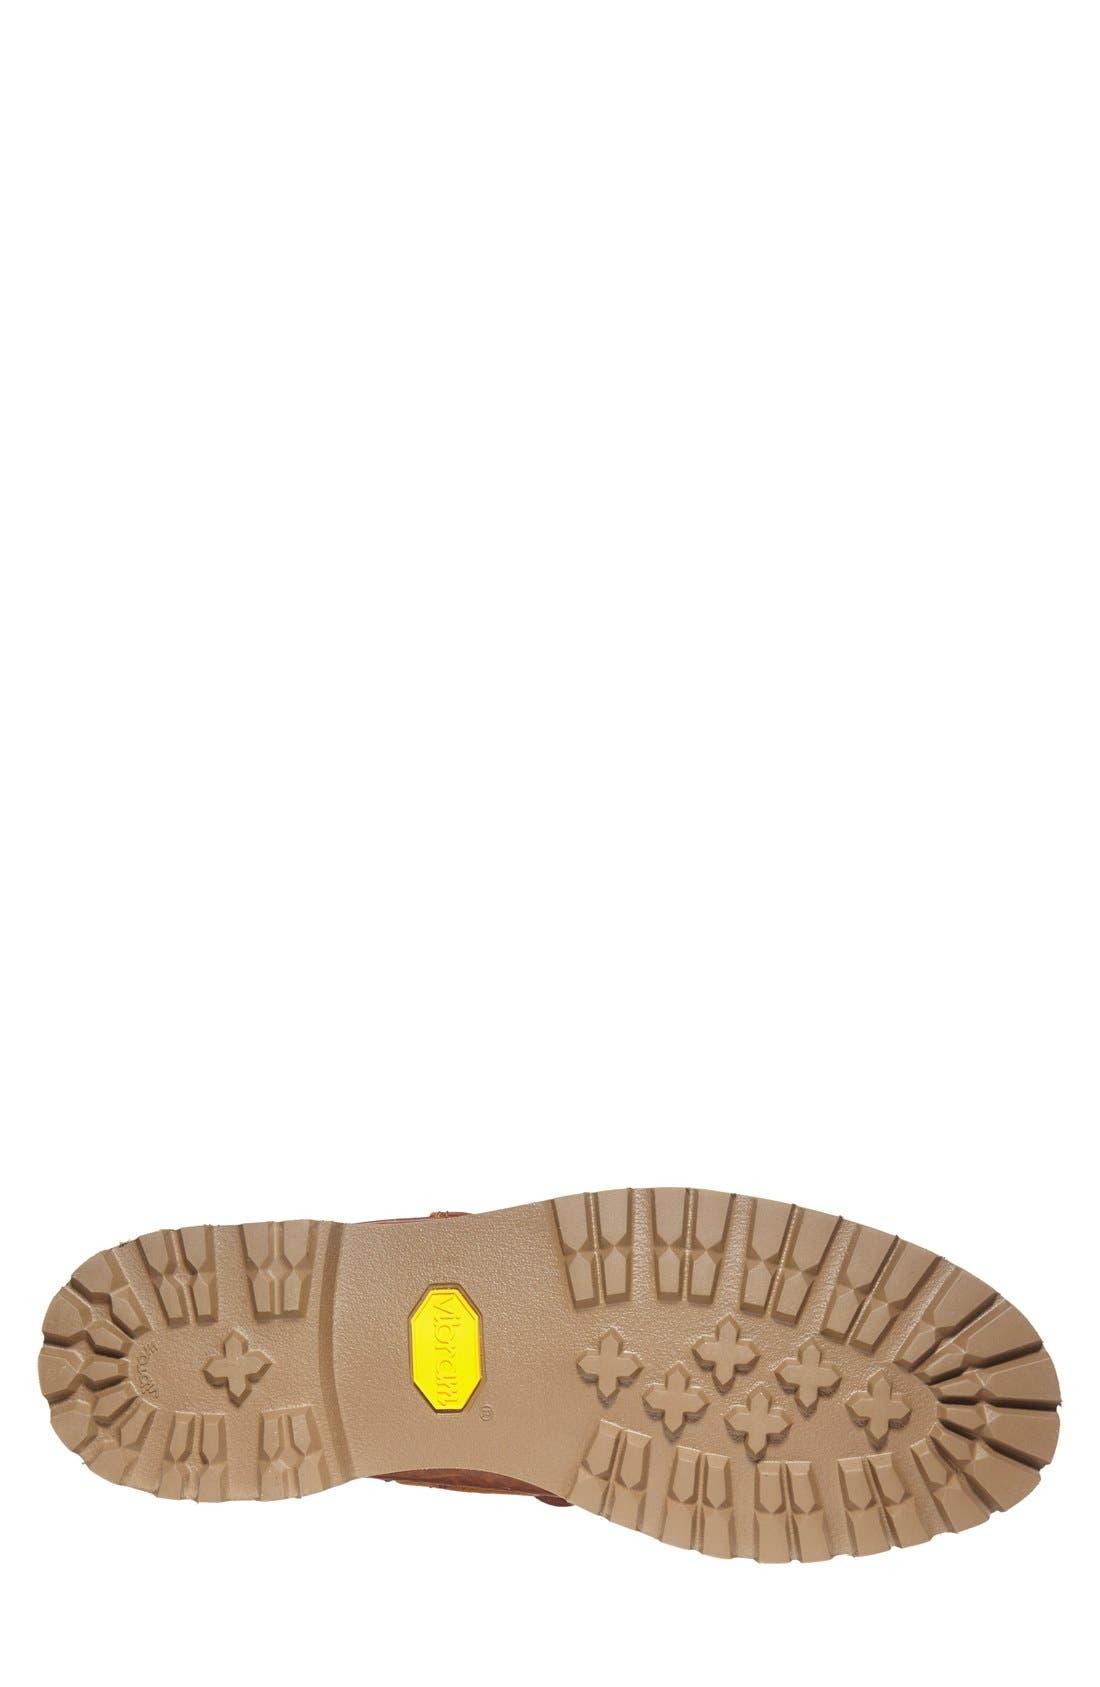 'Custer' Boat Shoe,                             Alternate thumbnail 3, color,